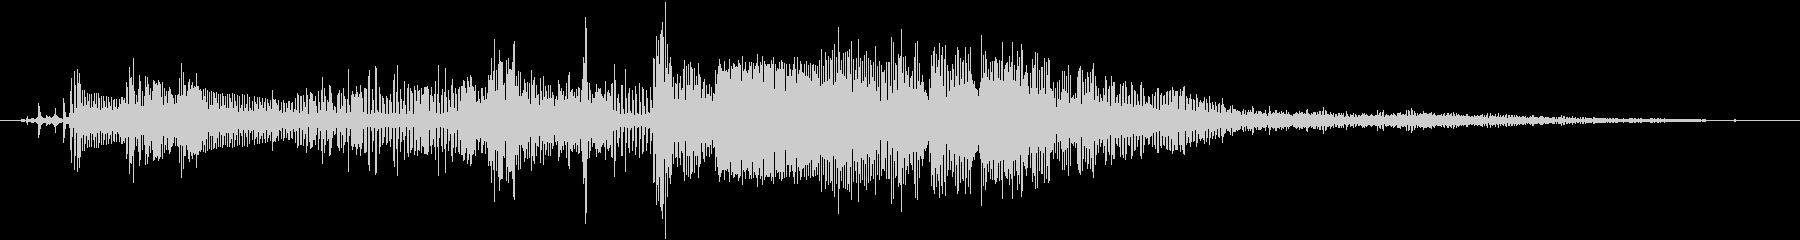 250 Cc Atv 4X4:2つ...の未再生の波形